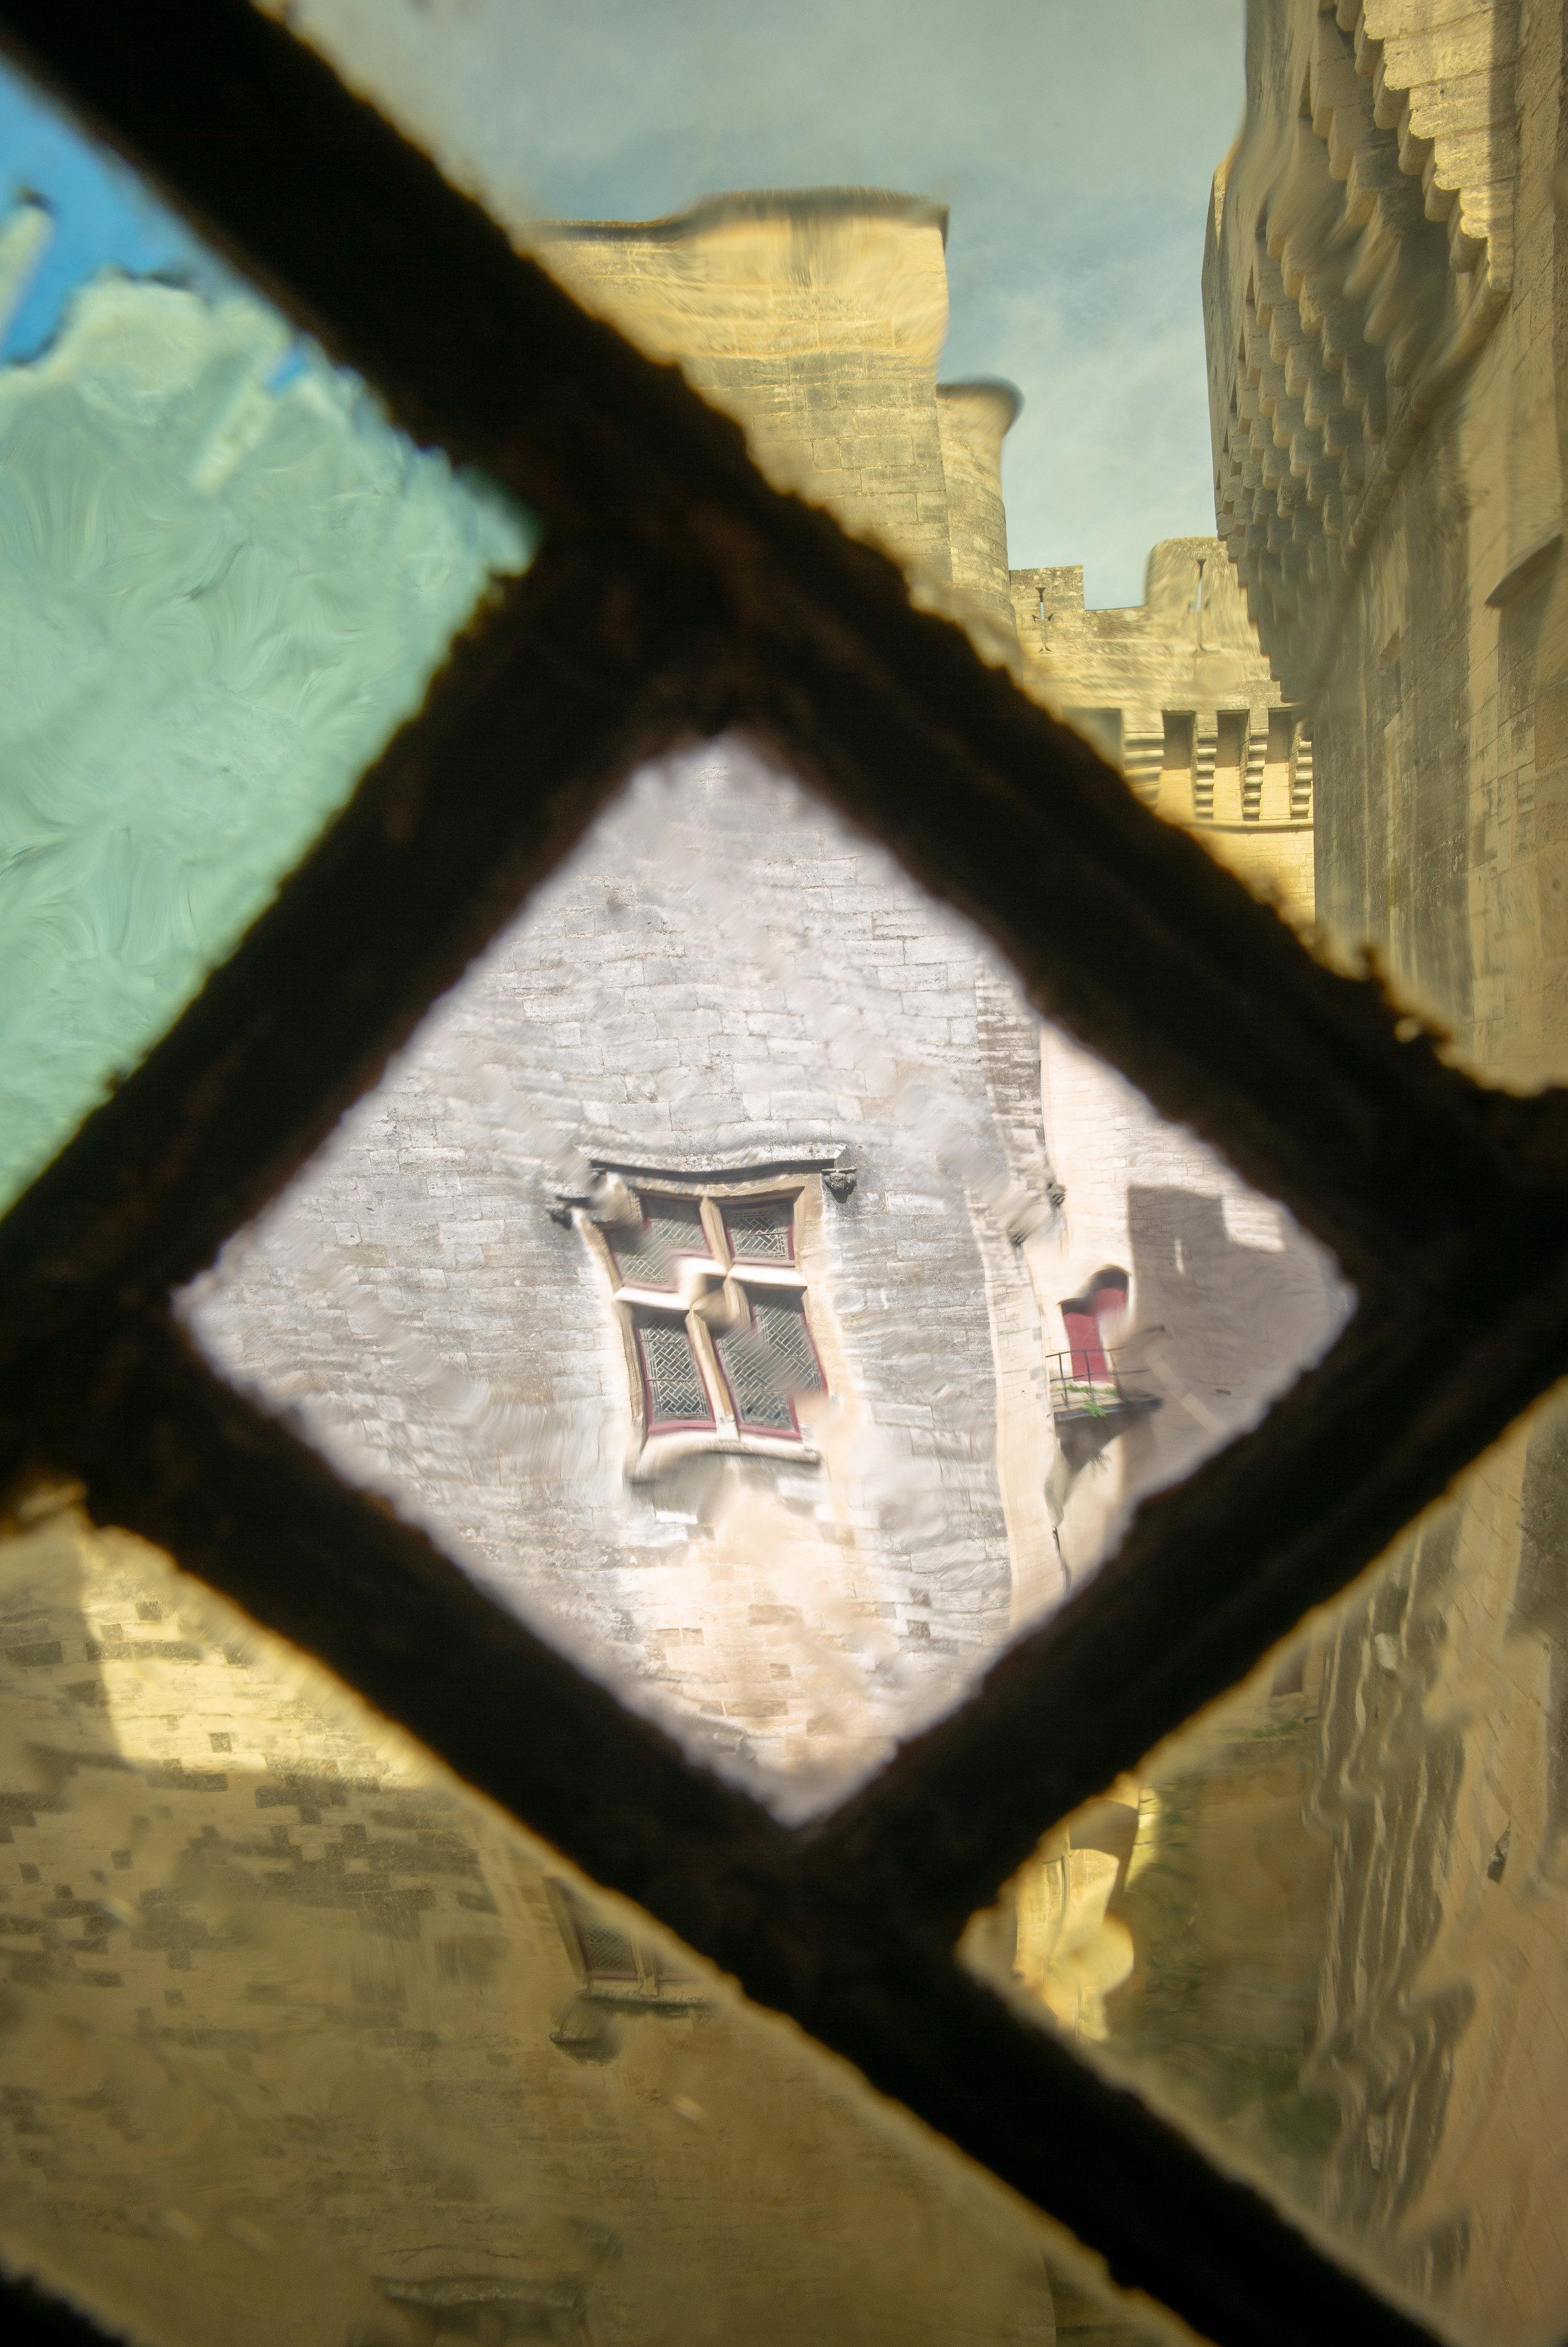 Interior Window facing the Court Yard in Château de Tarascon, Tarascon, France